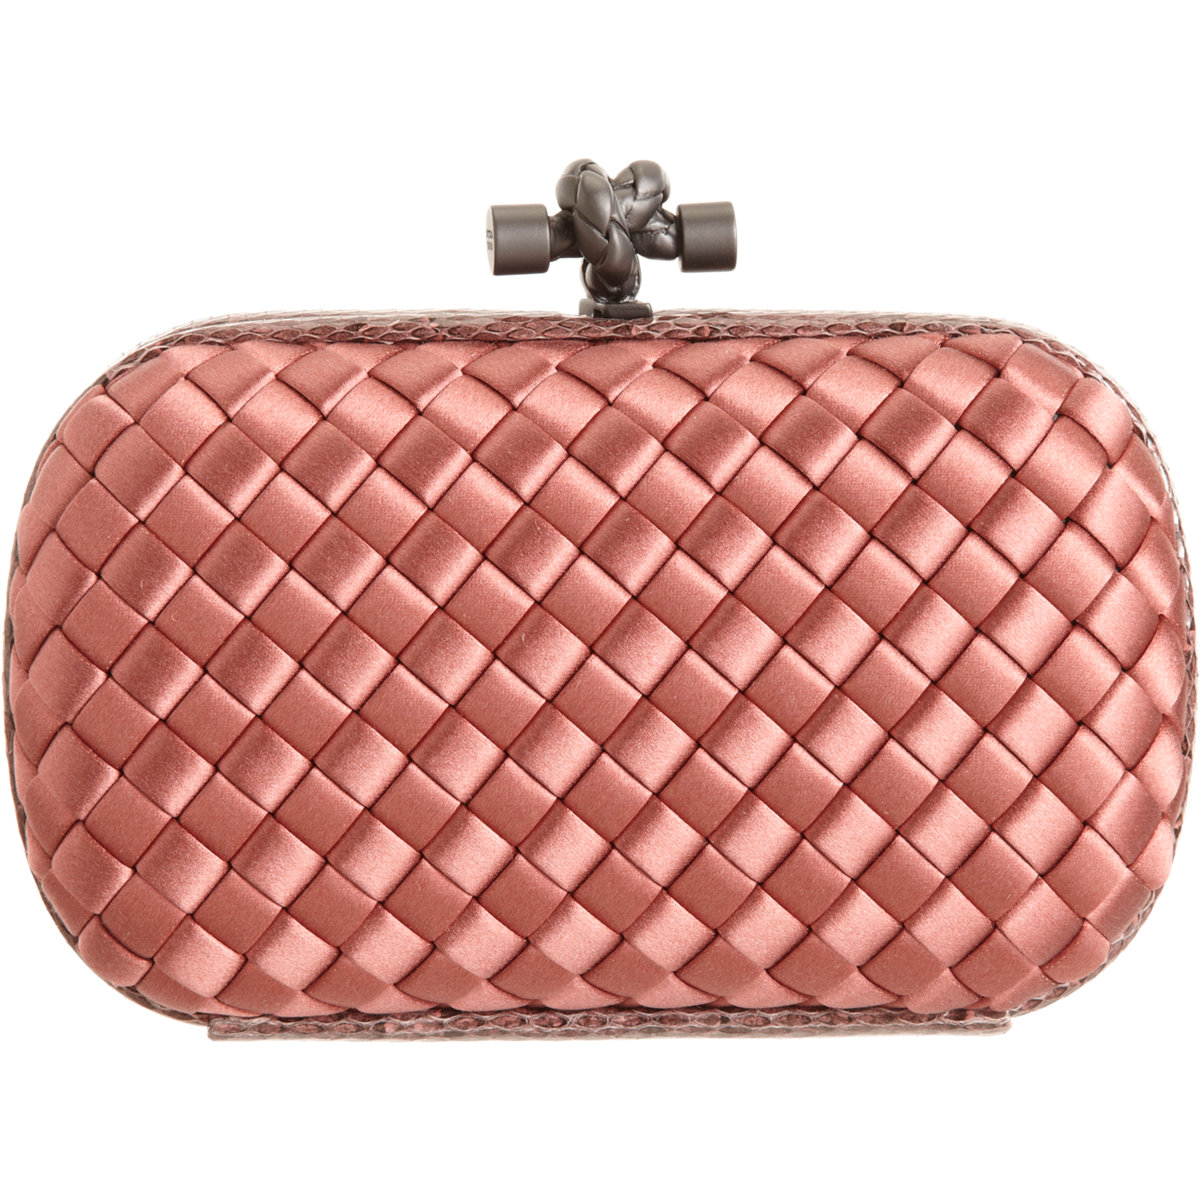 bottega veneta knot intrecciato satinsnakeskin clutch in pink lyst. Black Bedroom Furniture Sets. Home Design Ideas